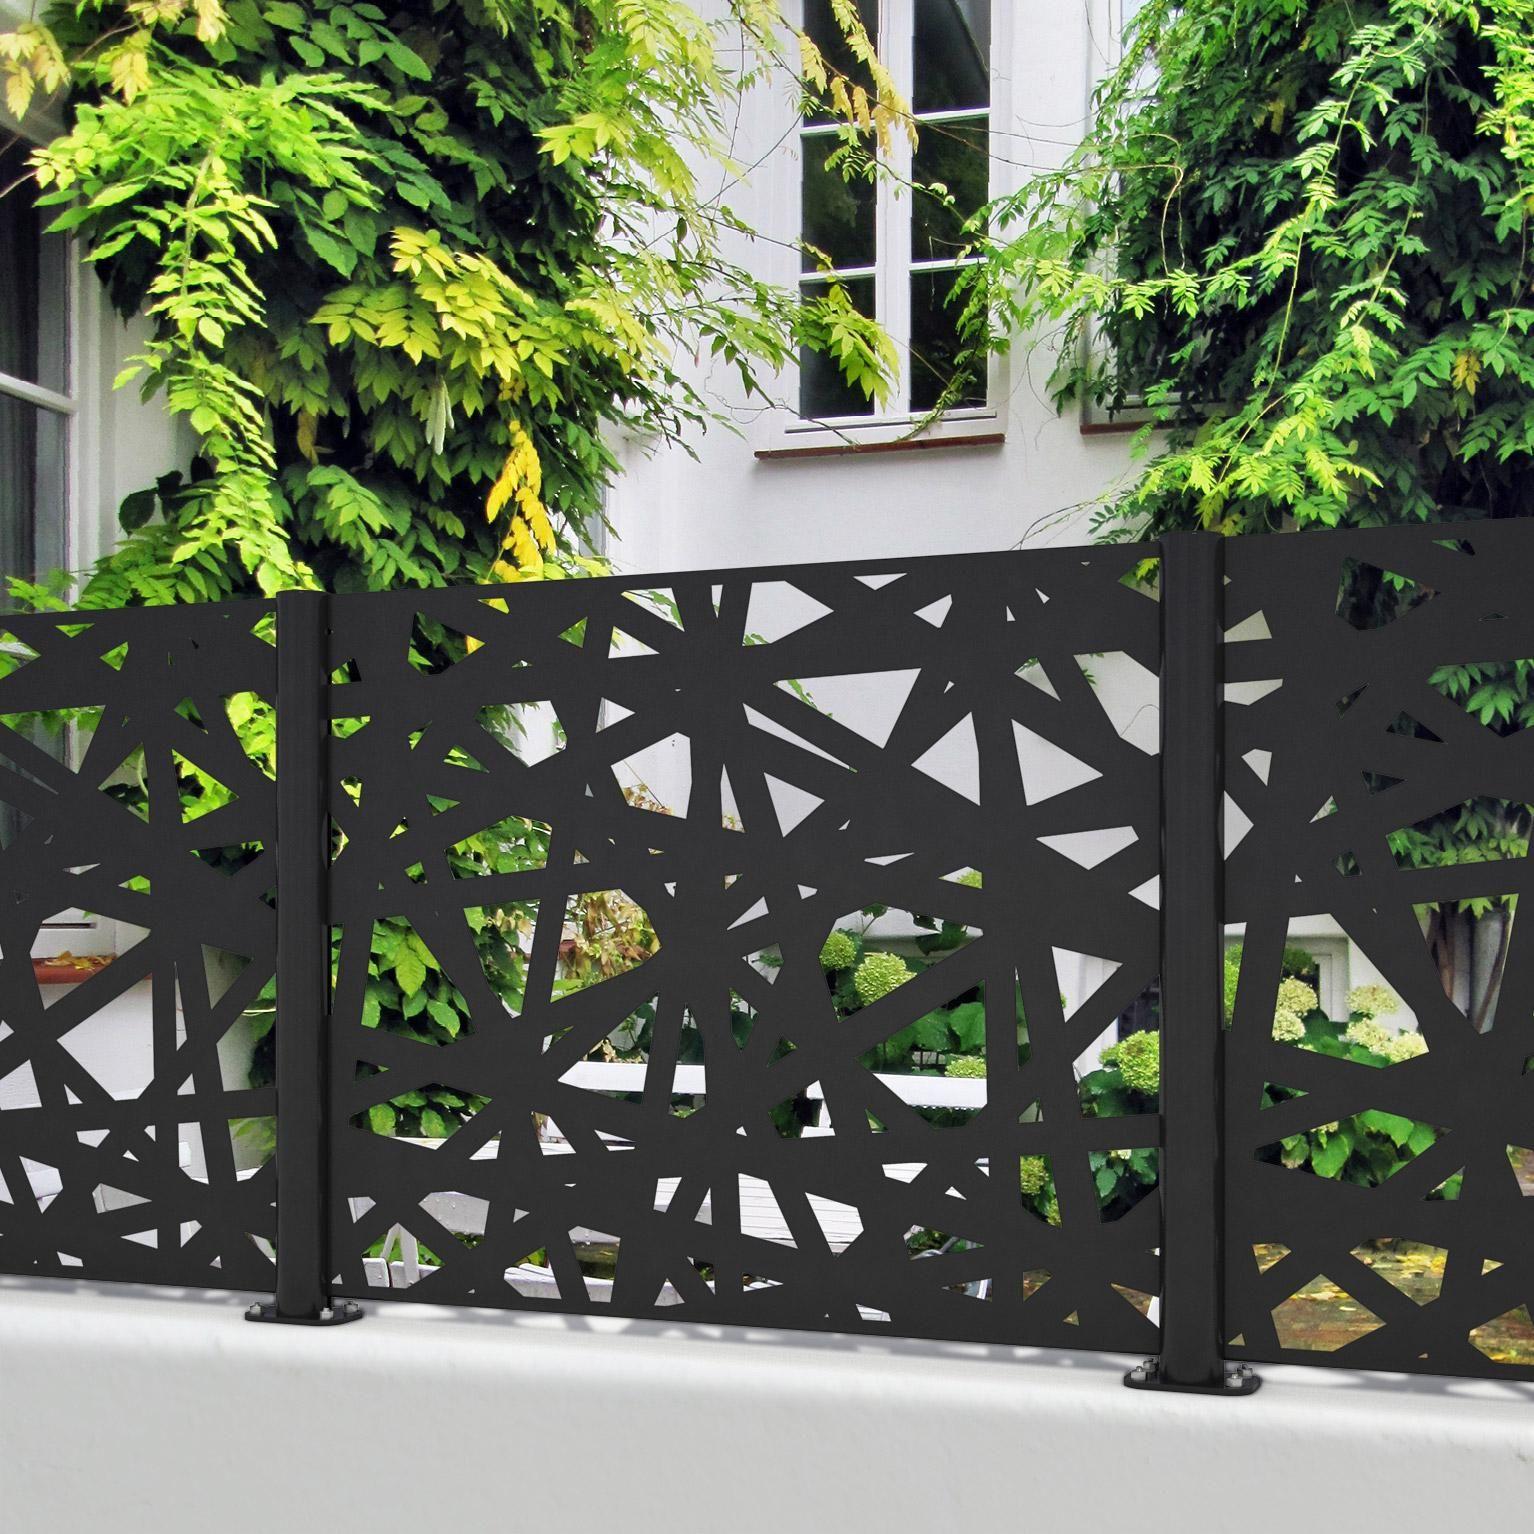 Claustra Alu Leroy Merlin clôture aluminium mikado noir, h.95 x l.120 cm en 2020